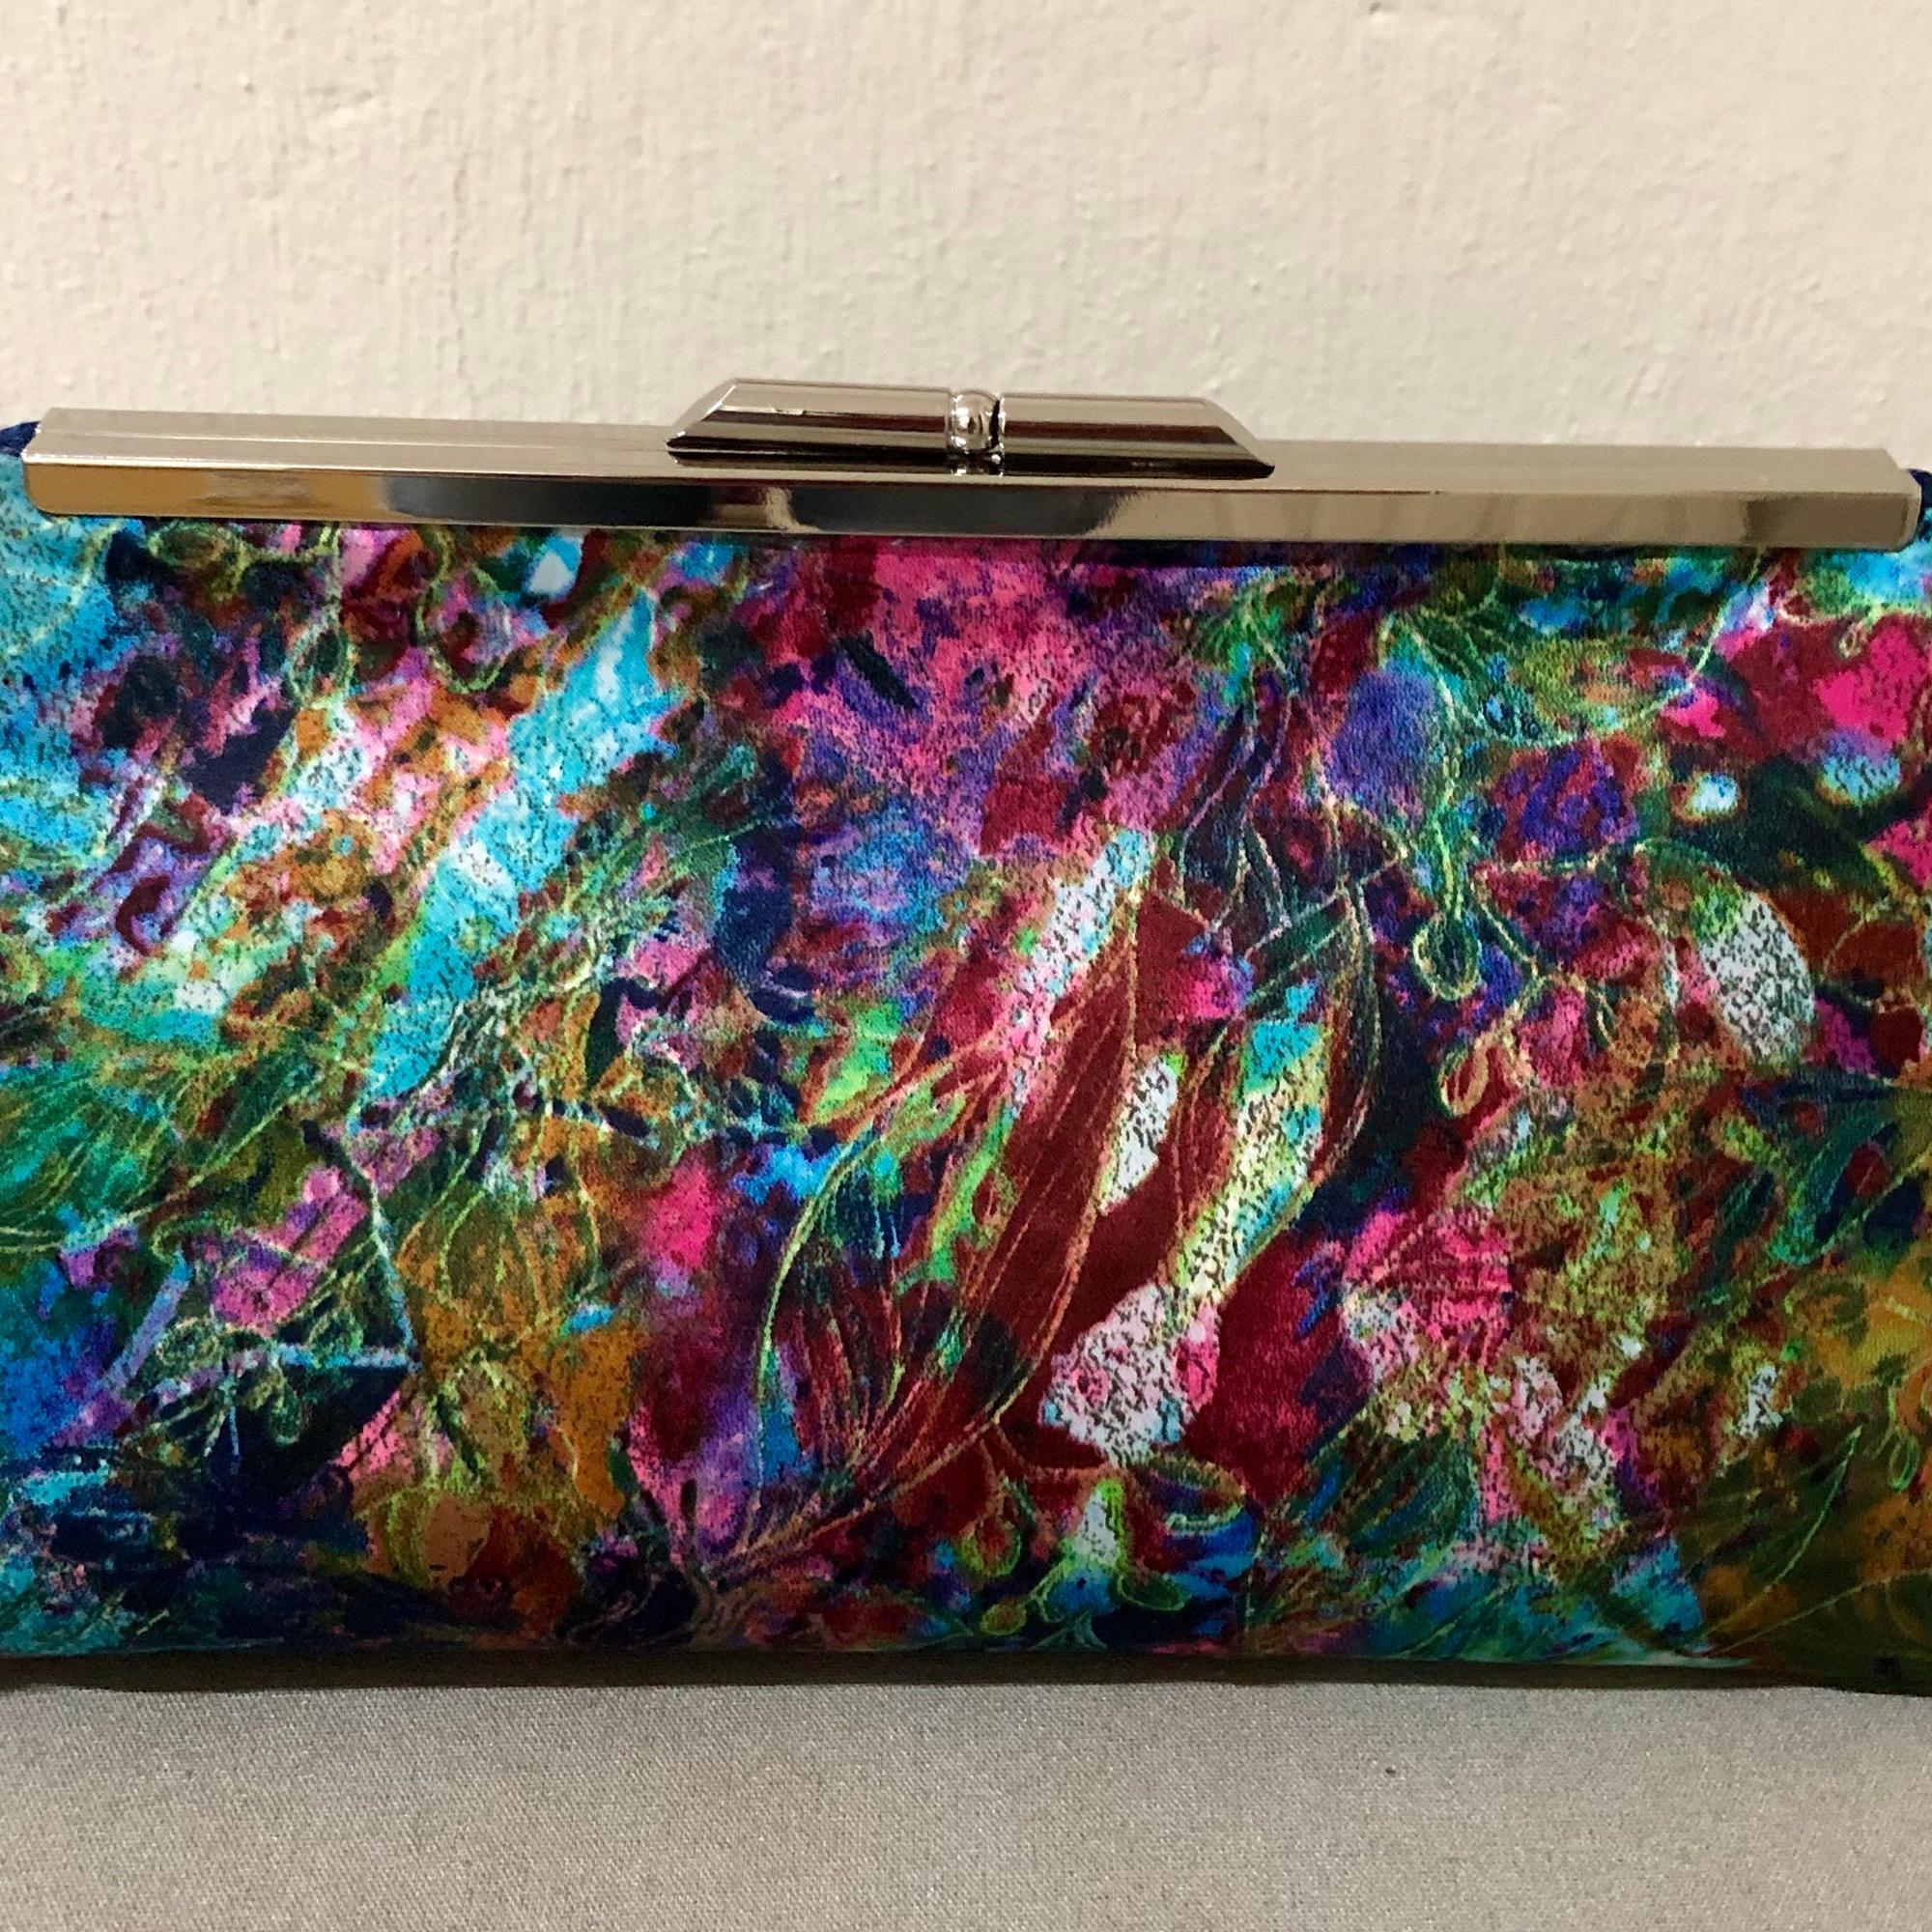 e618a4210 Bolsa Clutch Estampada Colorida no Elo7 | Eleganza Design (BEBBCC)